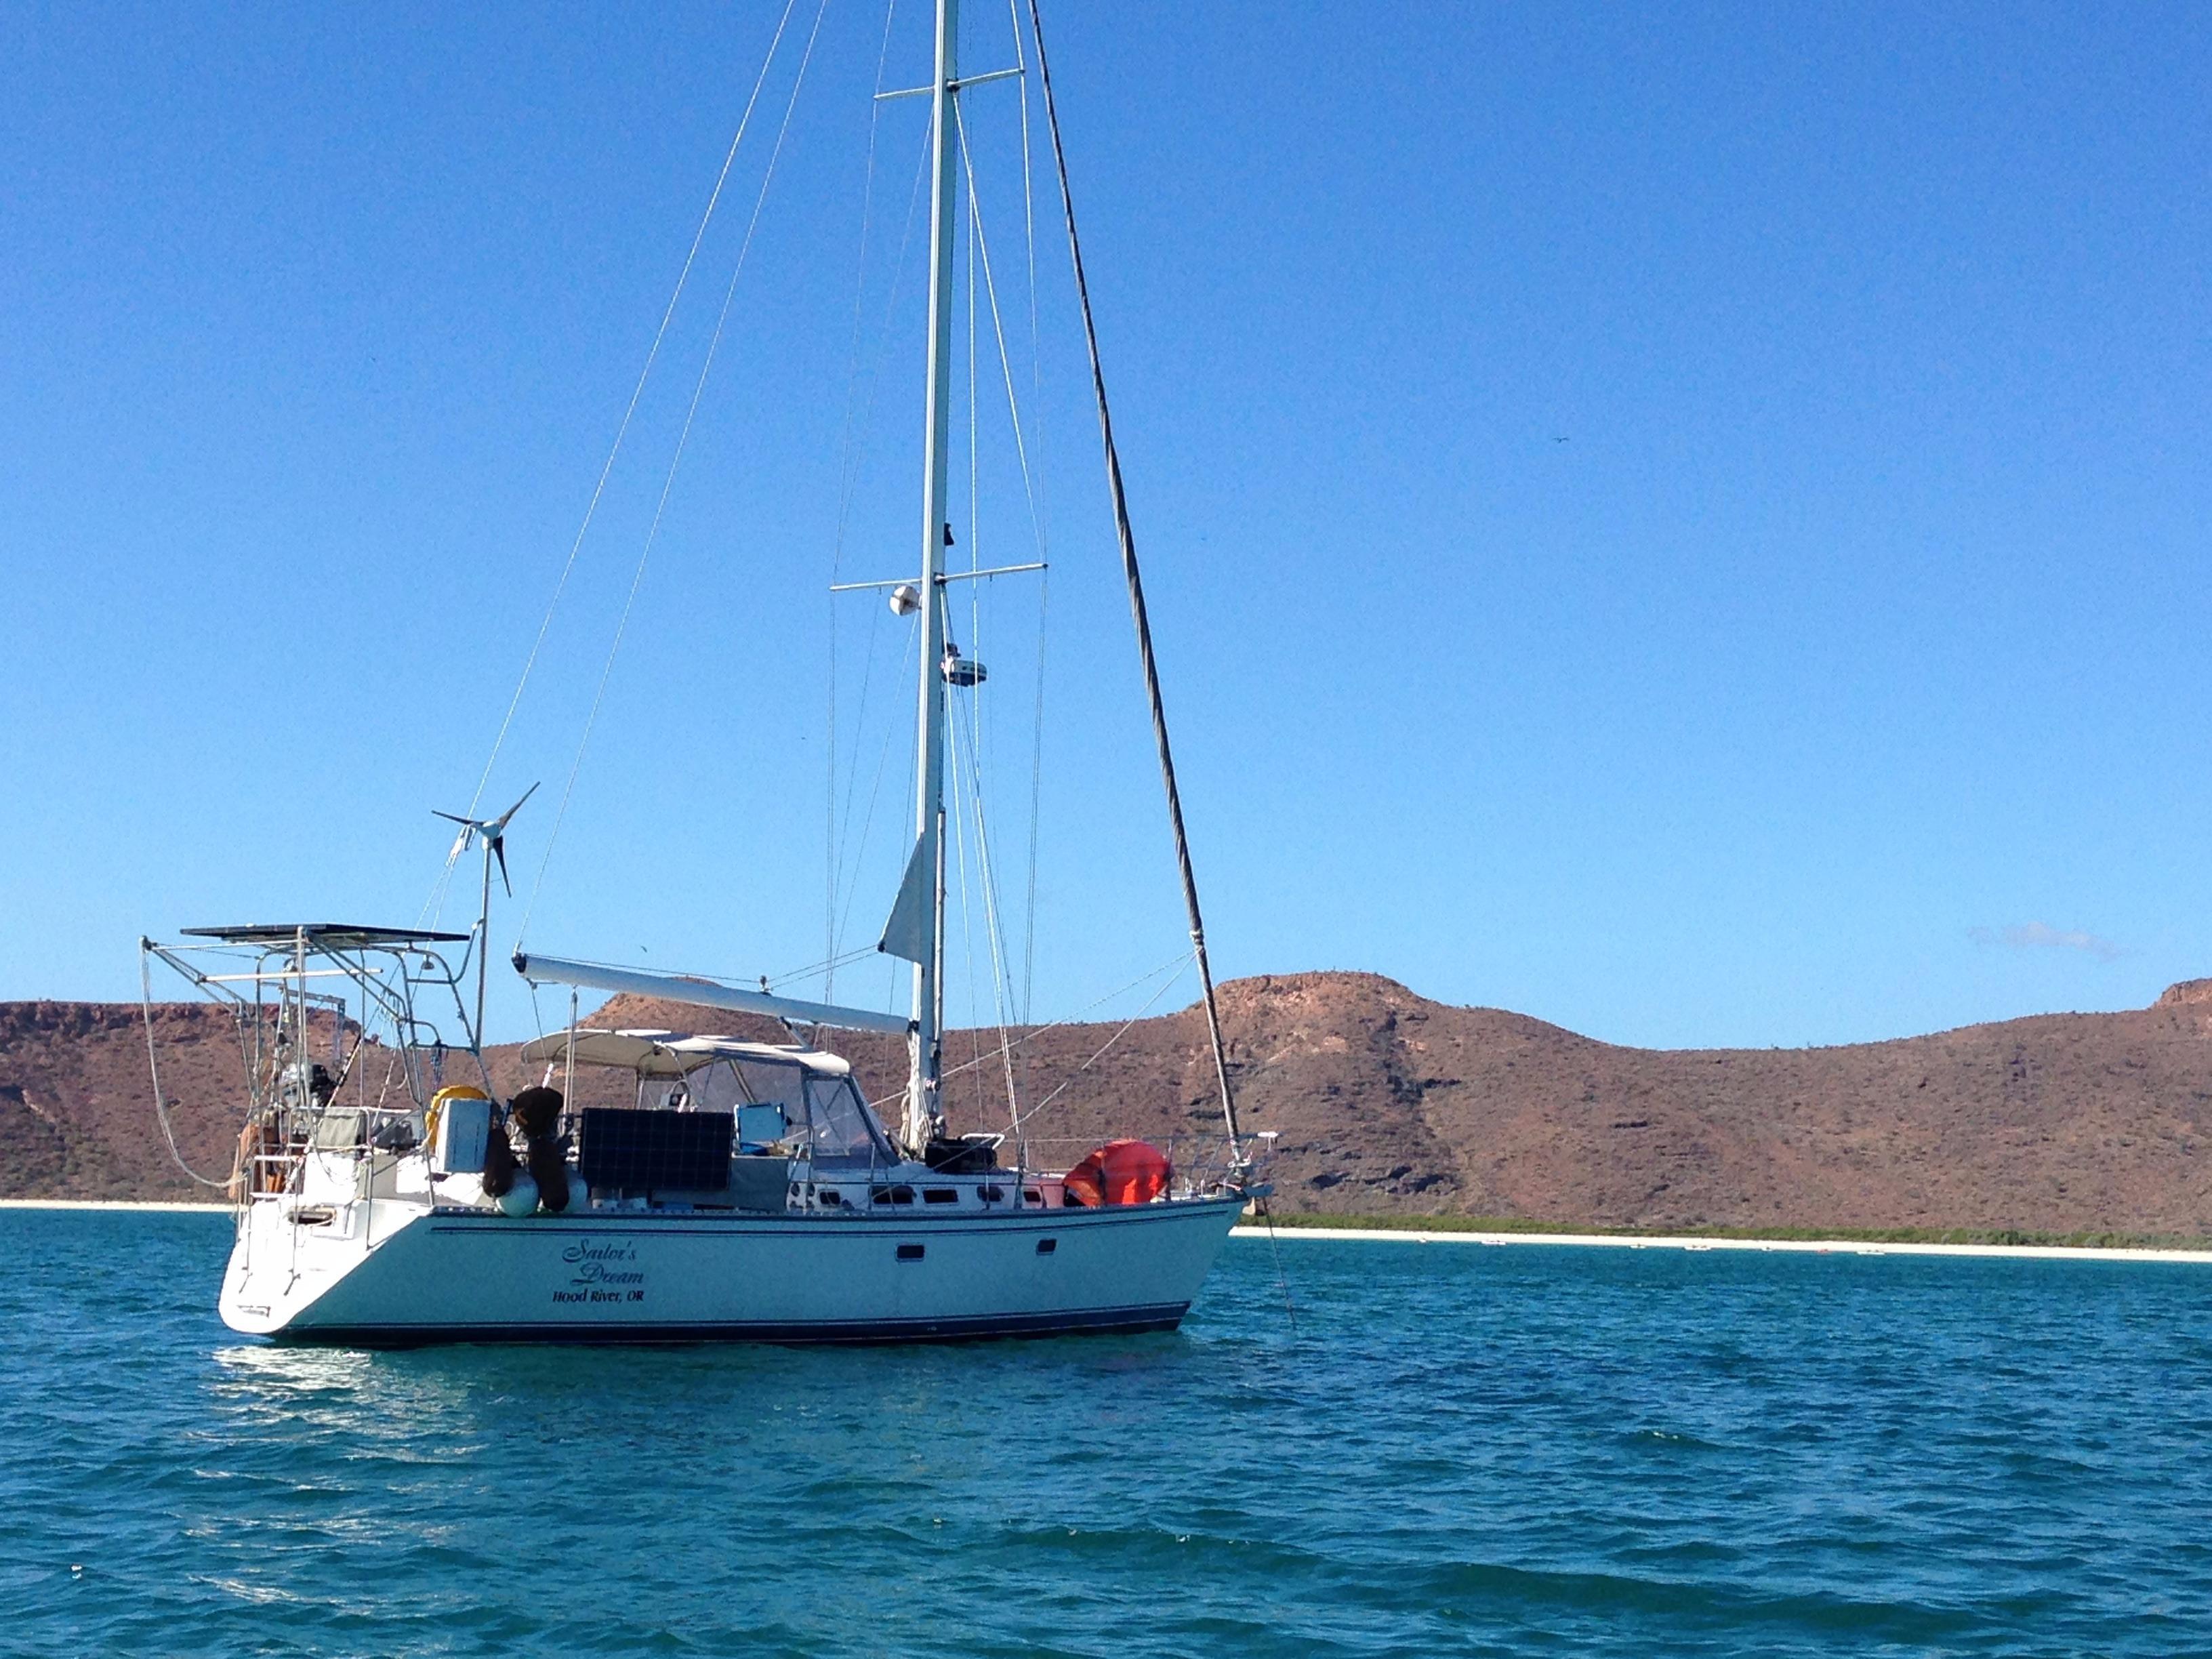 45' Catalina Morgan Center Cockpit+Boat for sale!